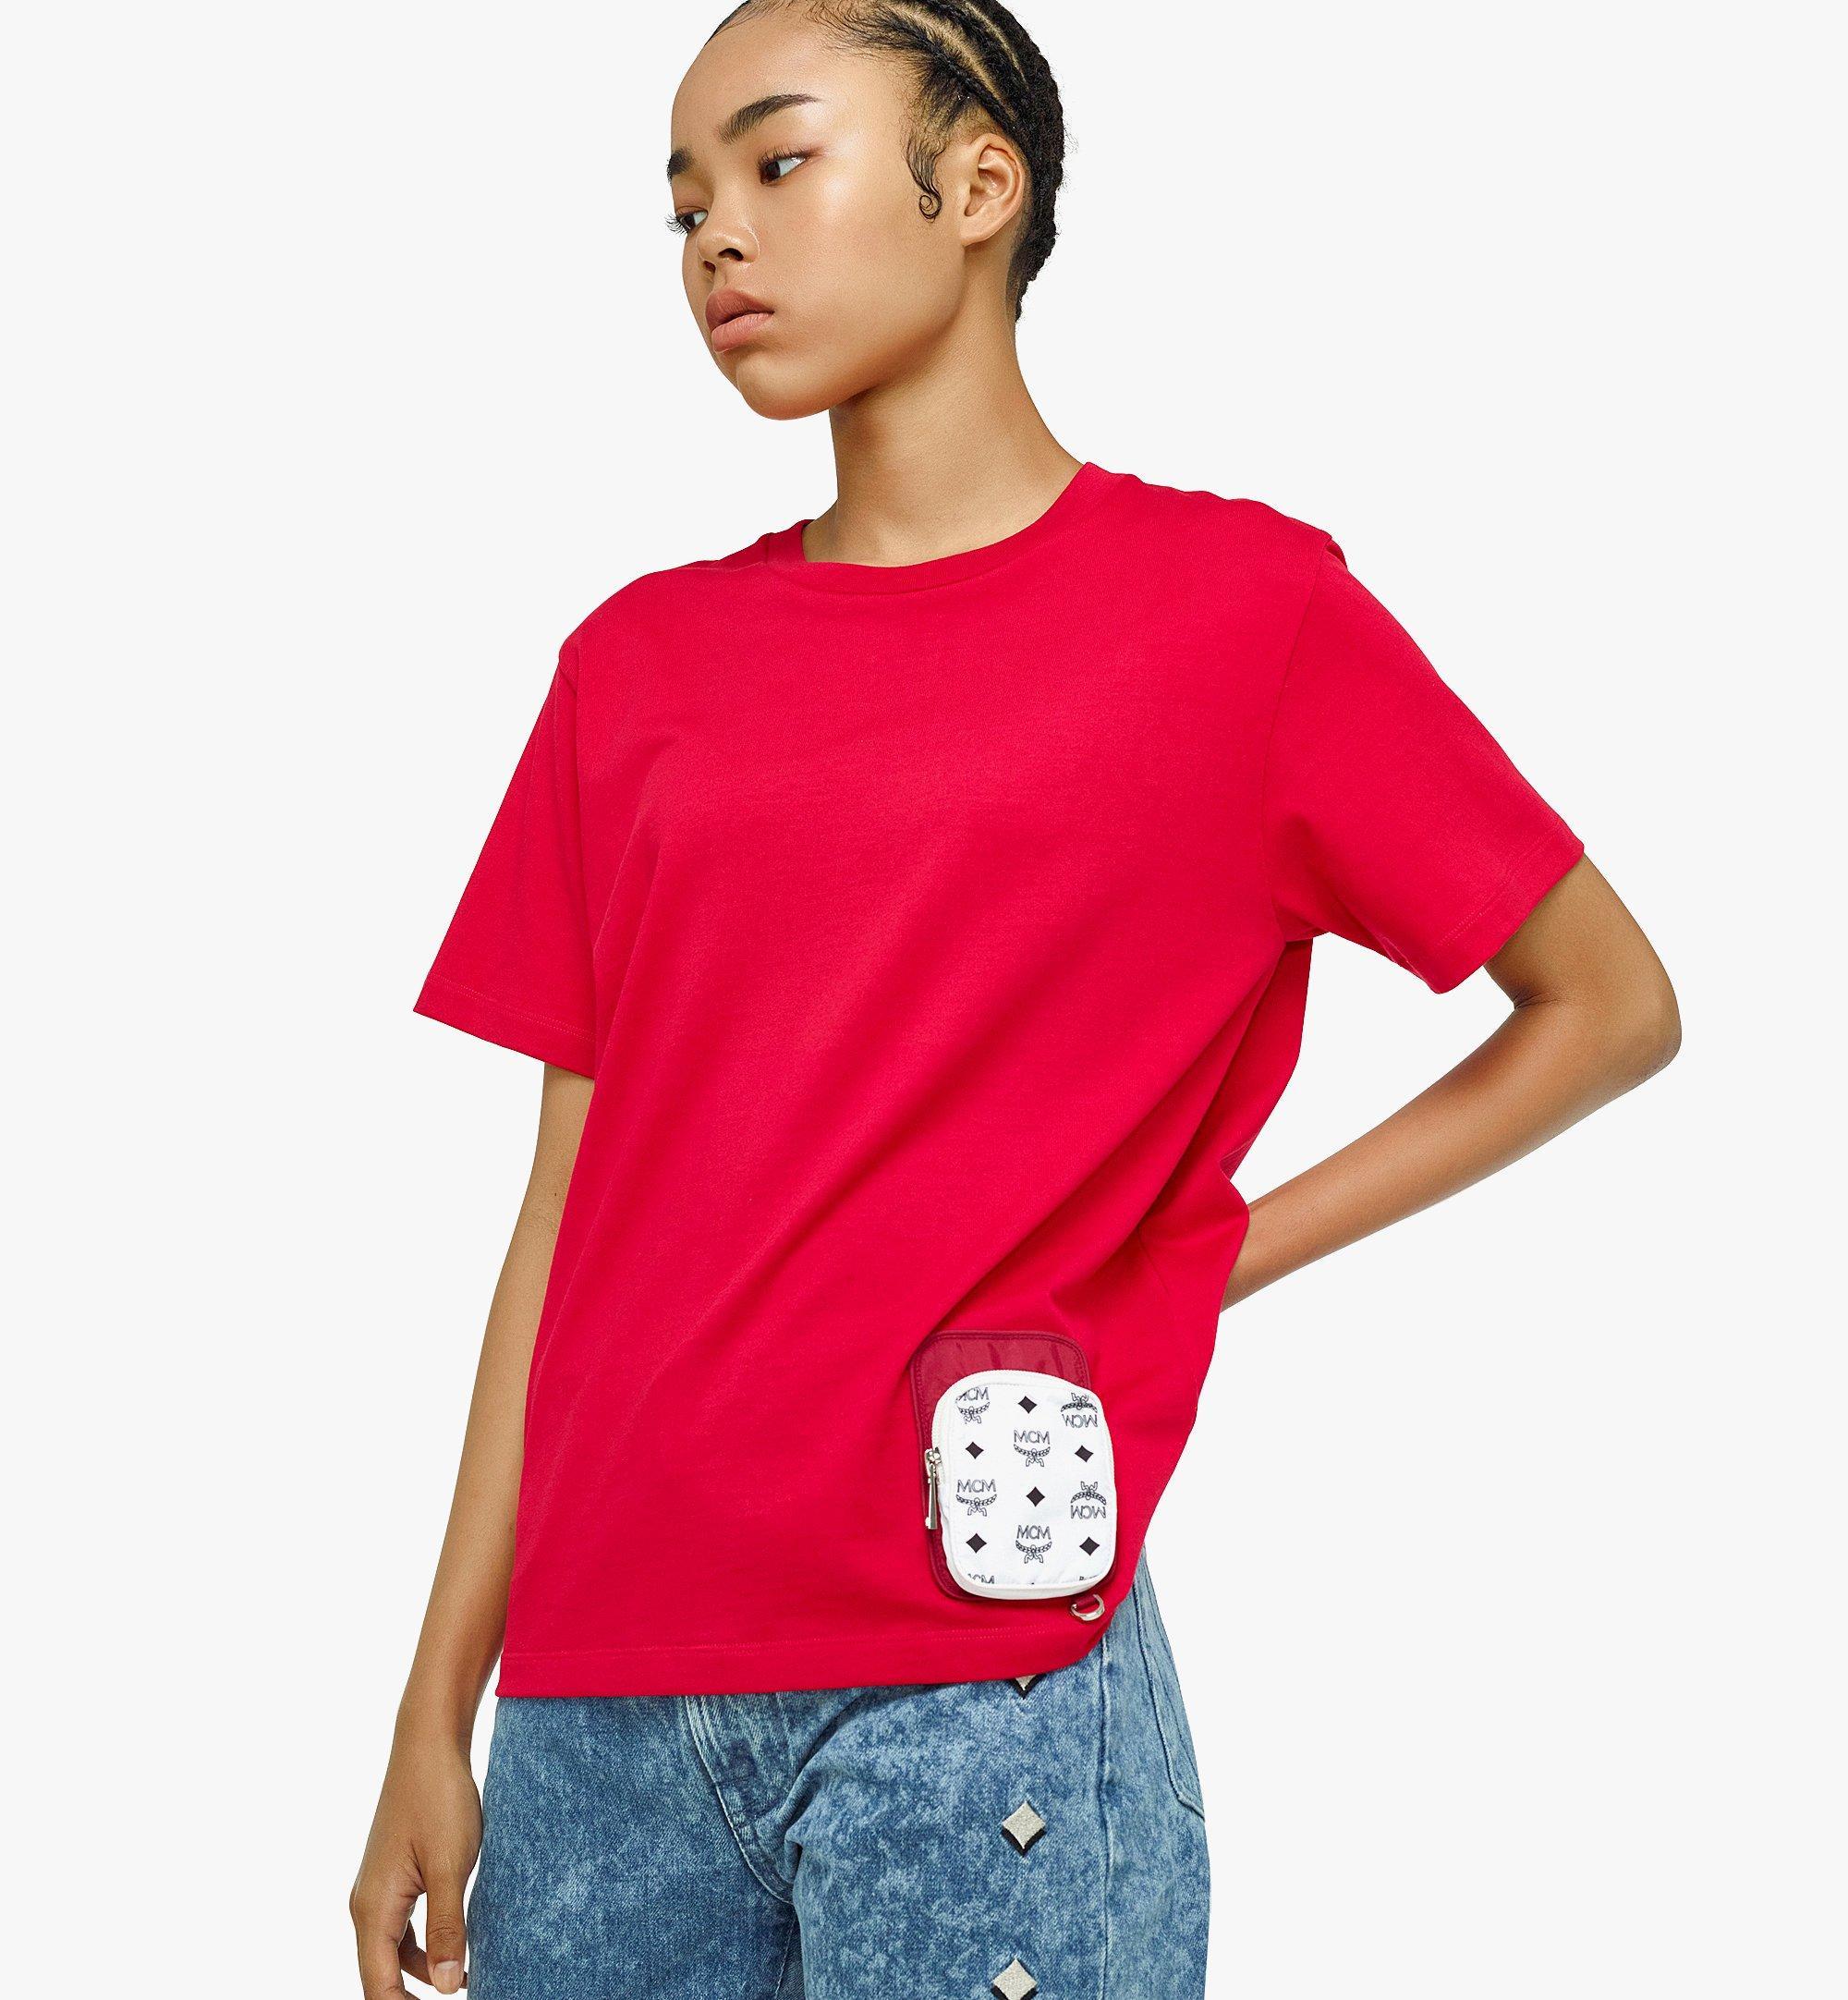 MCM Women's Organic Cotton T-Shirt with Nylon Zip Pocket Red MFTBAMM02R000L Alternate View 2